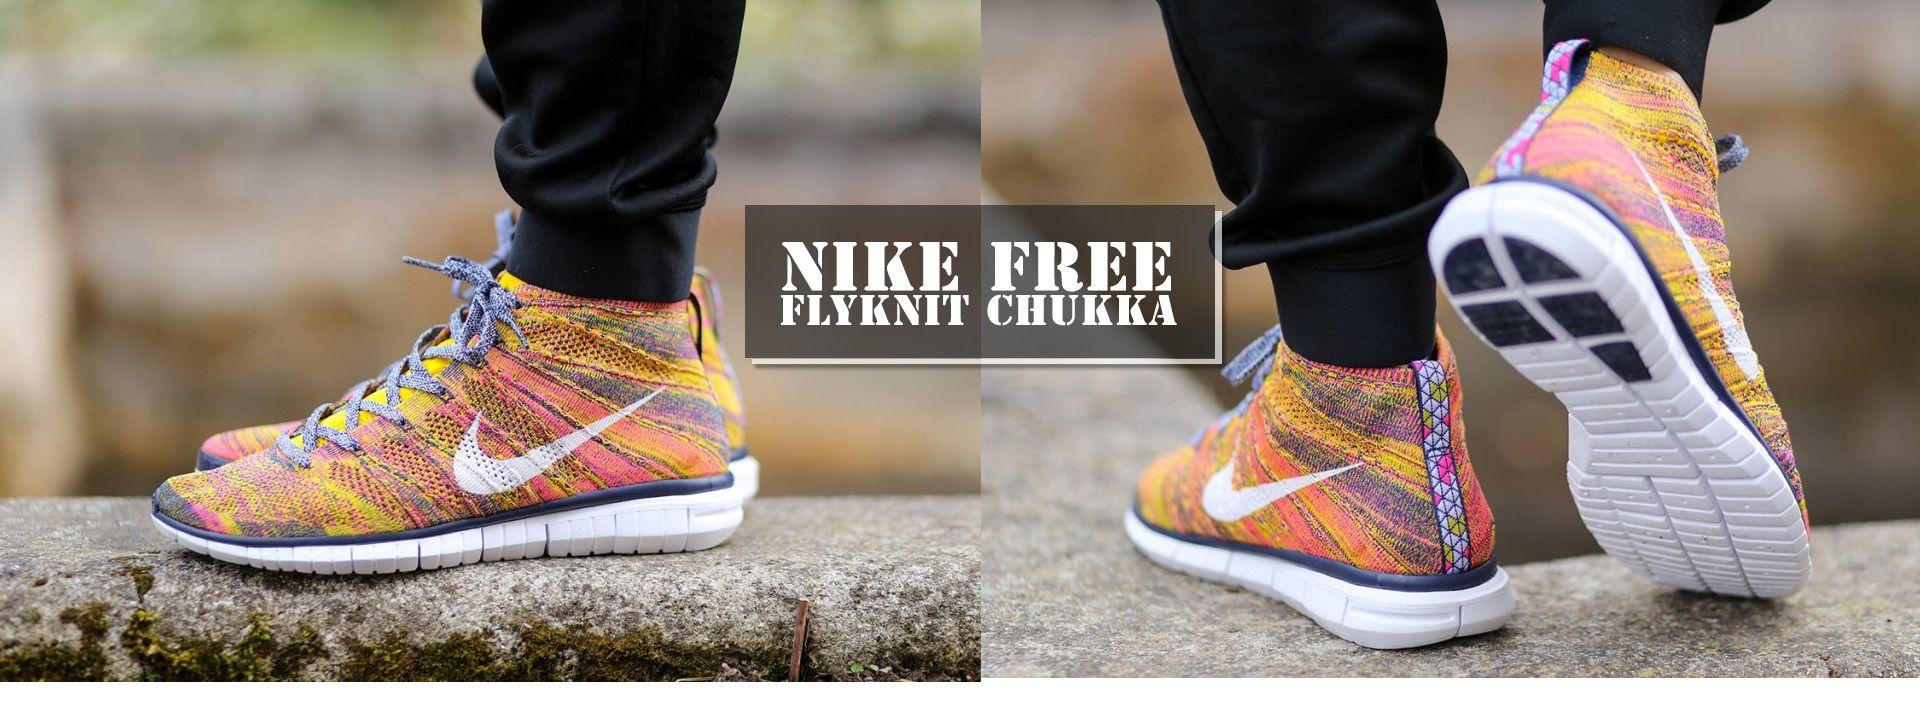 zapatillas running nike mujer ofertas